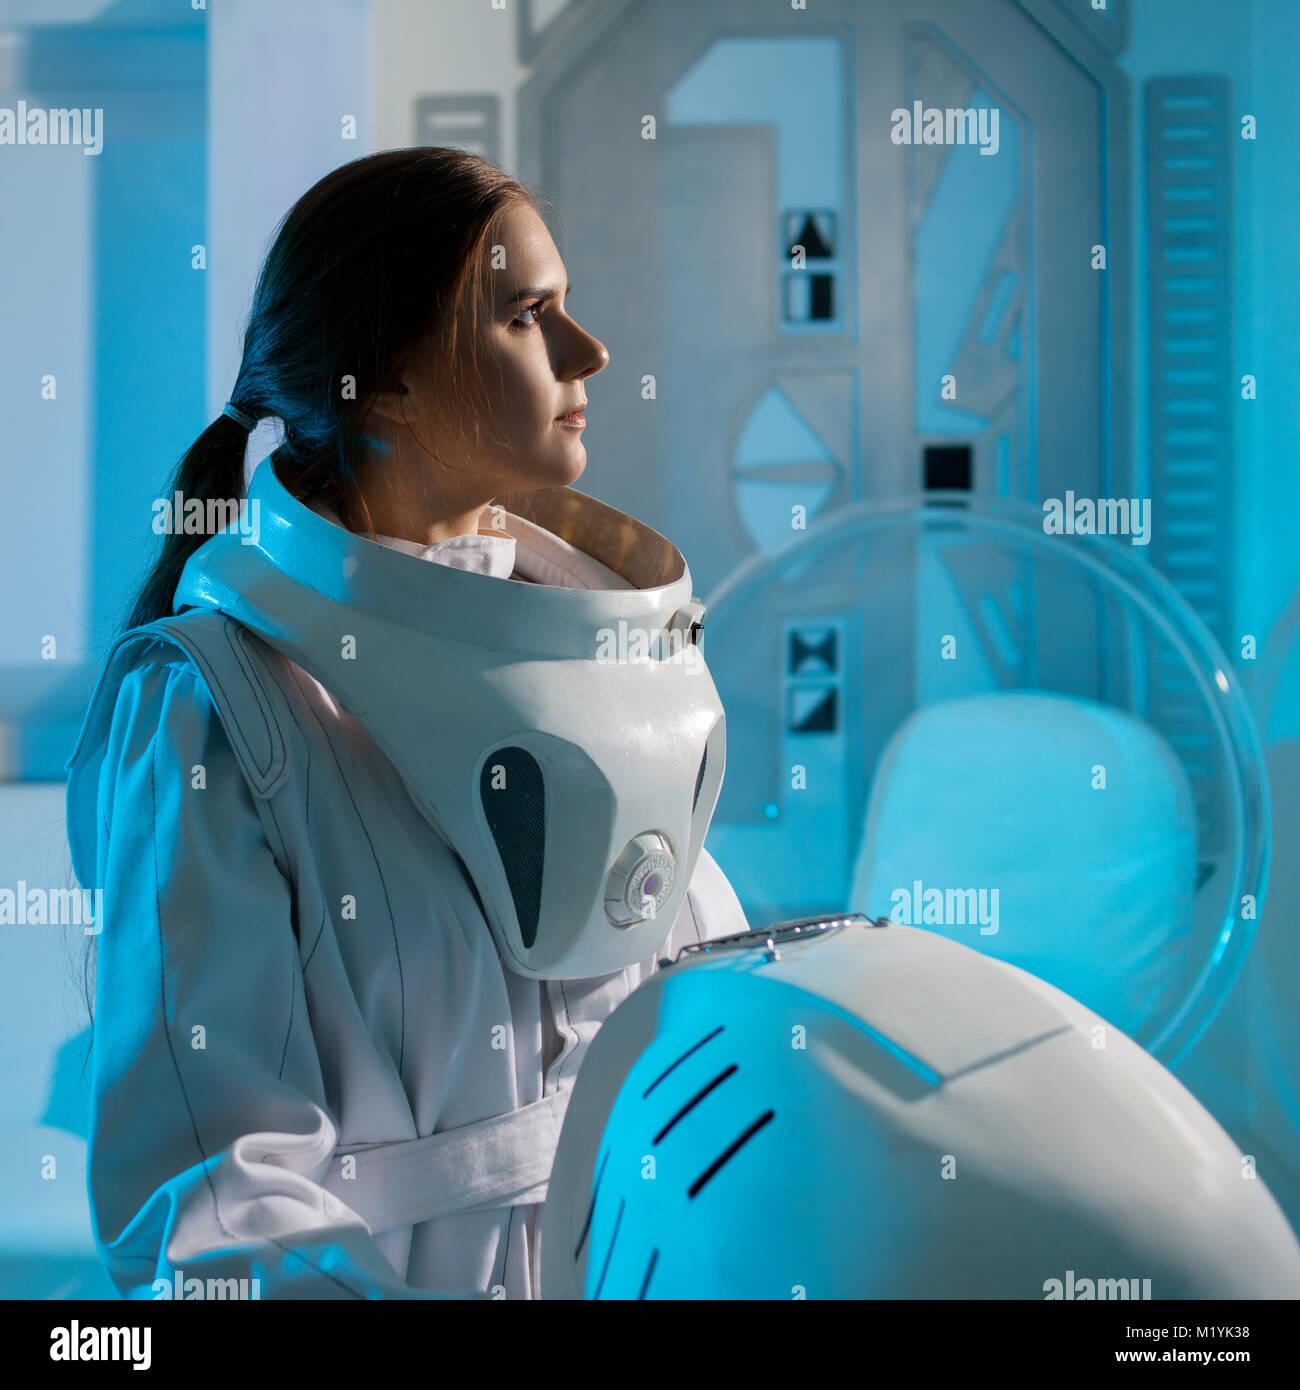 woman astronaut in diaper - HD1300×1390